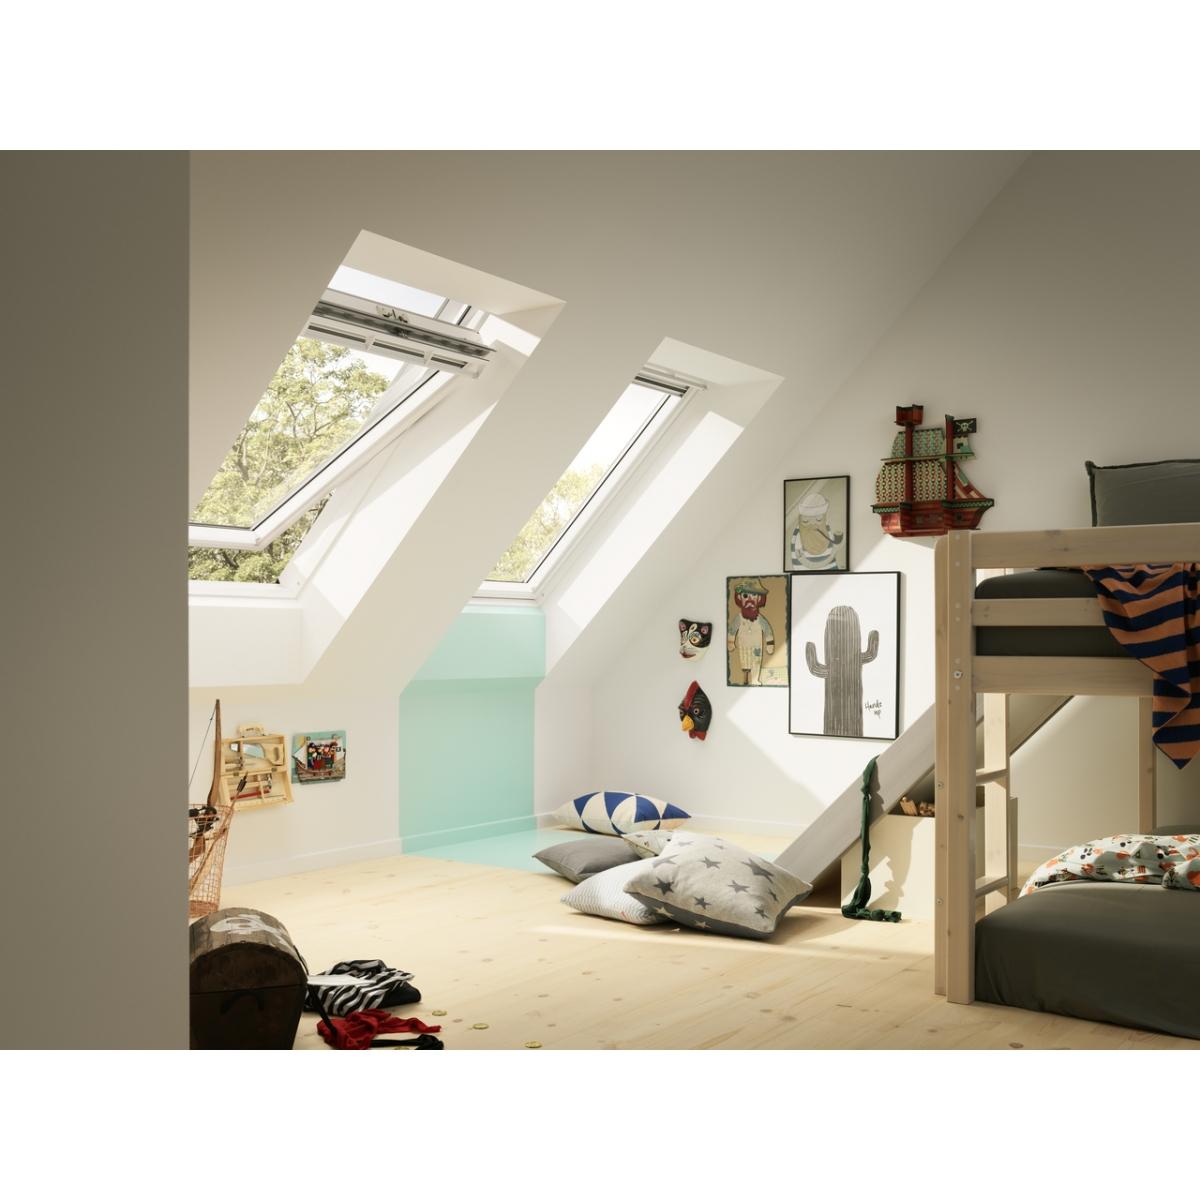 Ambiente habitacion ventana giratoria VELUX